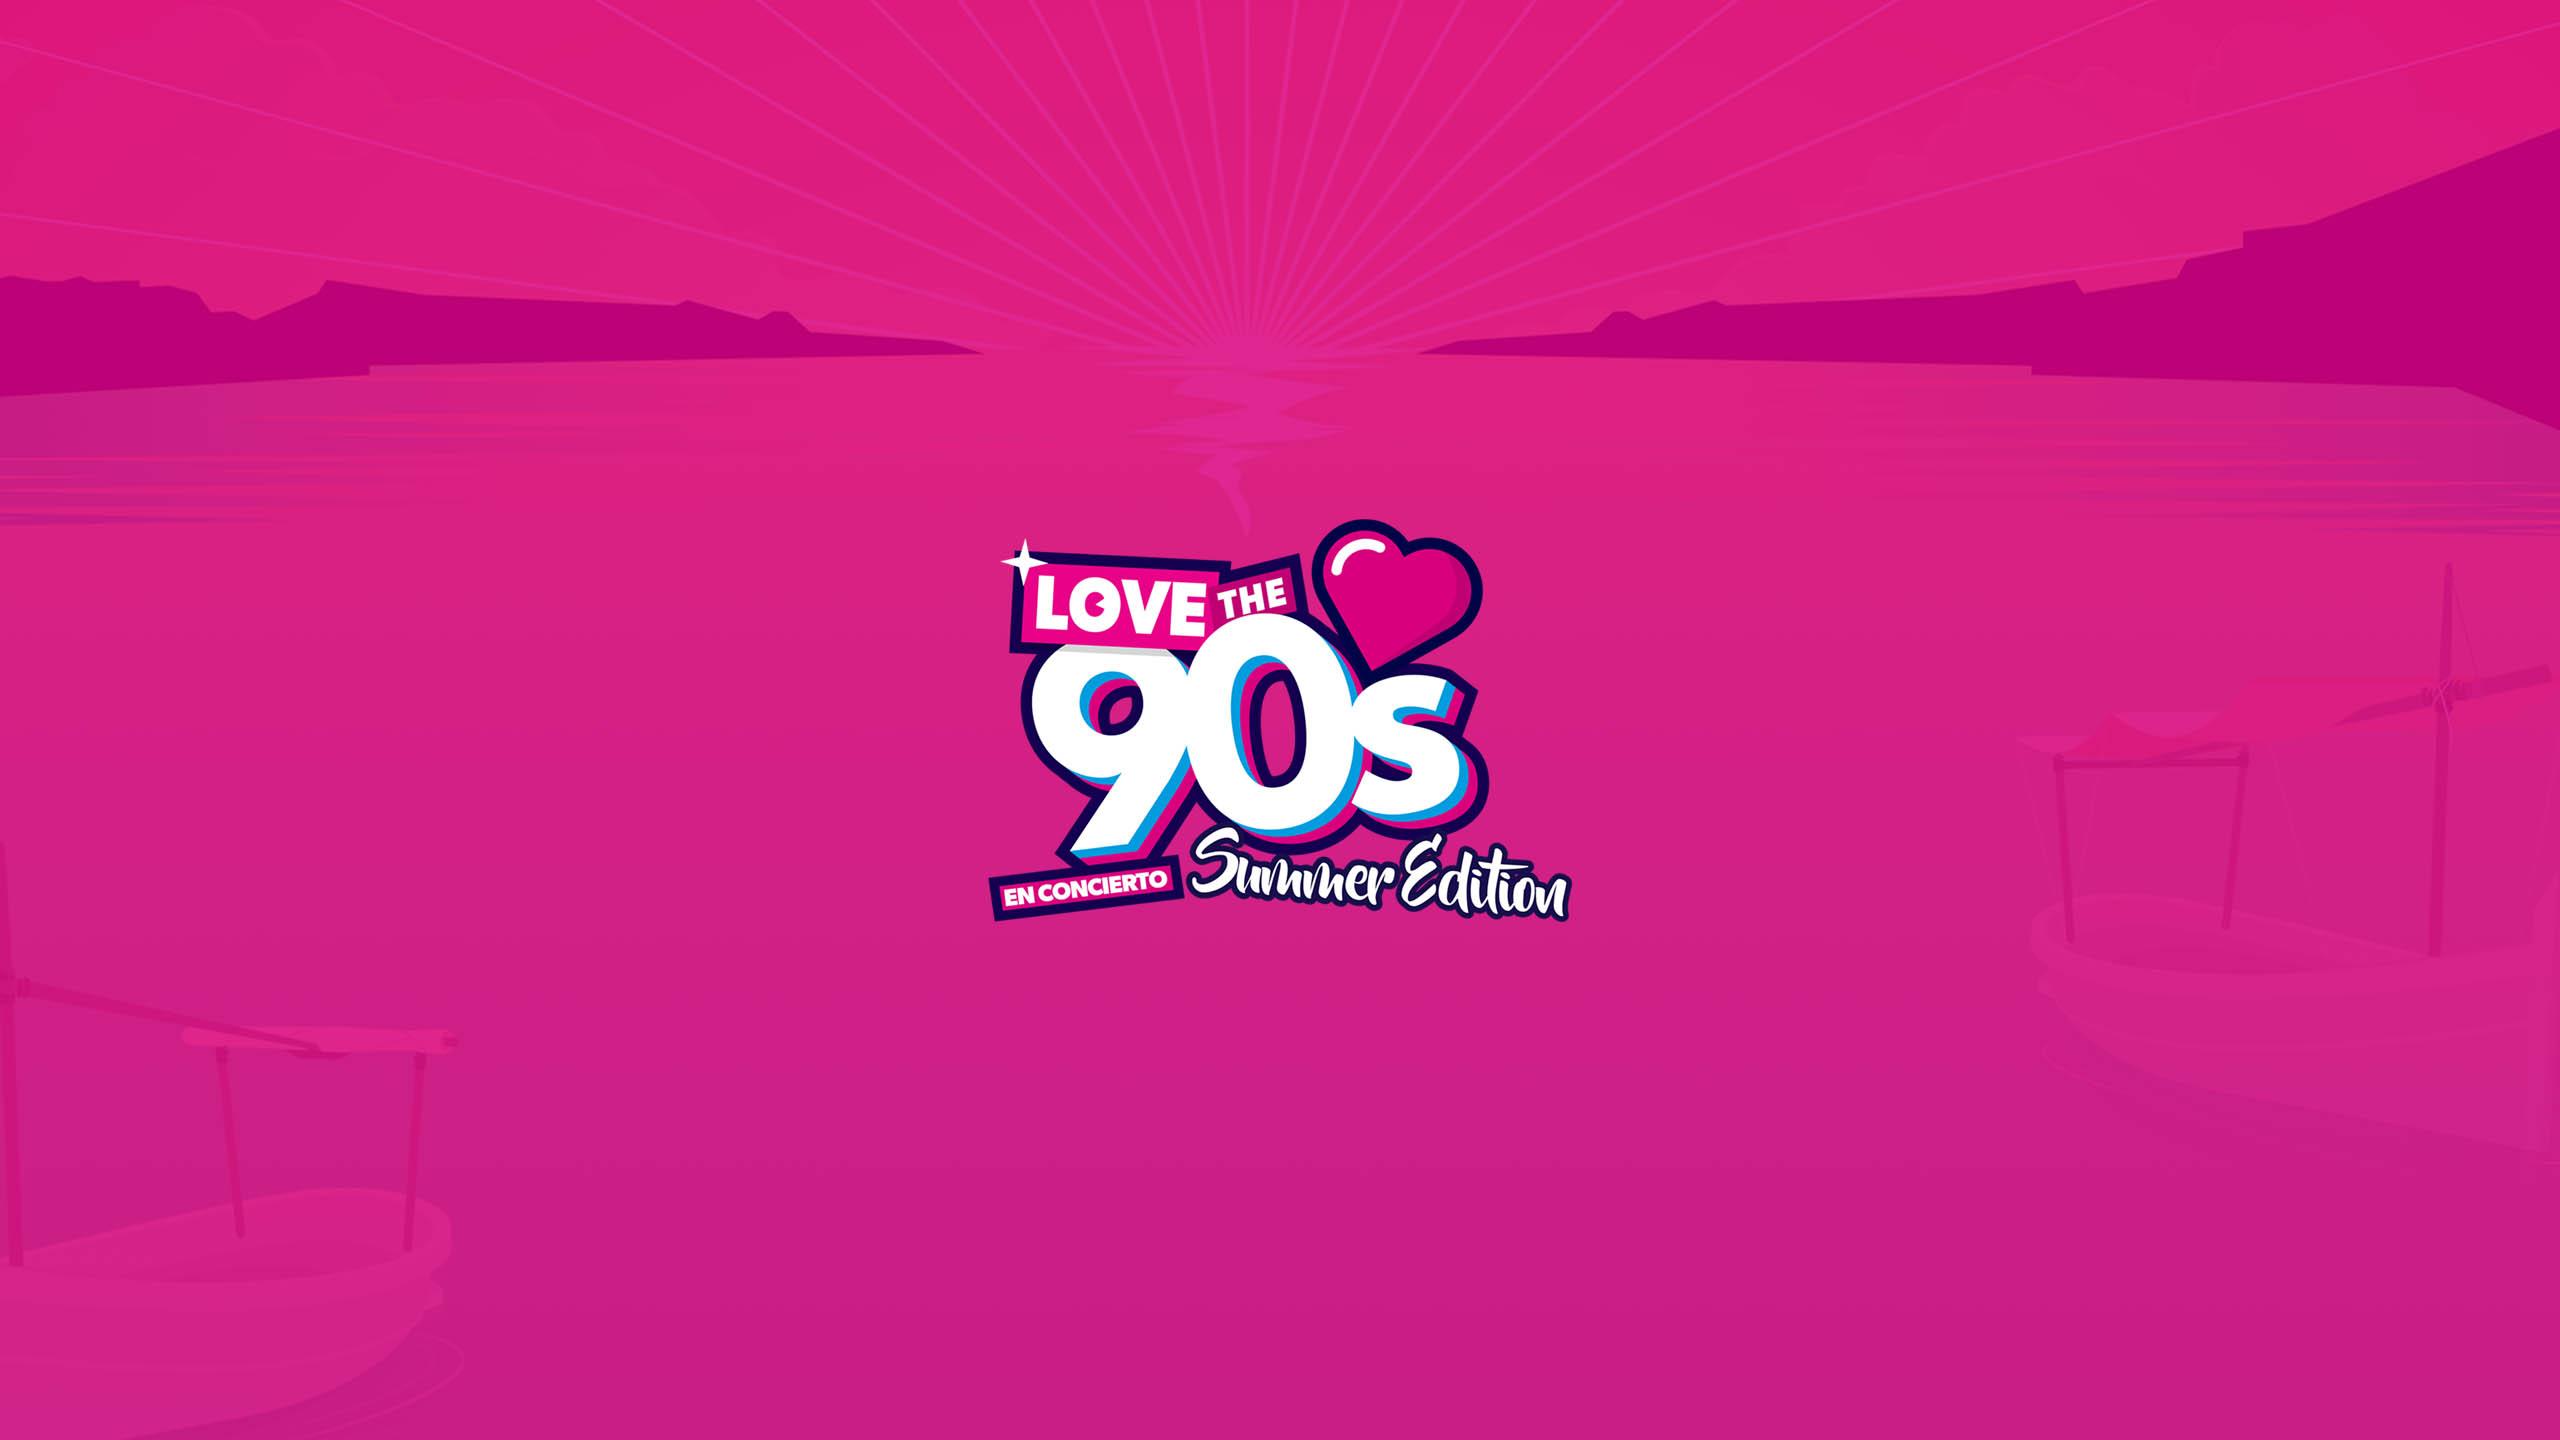 Mabull Events | Projectes | Love the 90s: Mallorca Summer Edition (4)